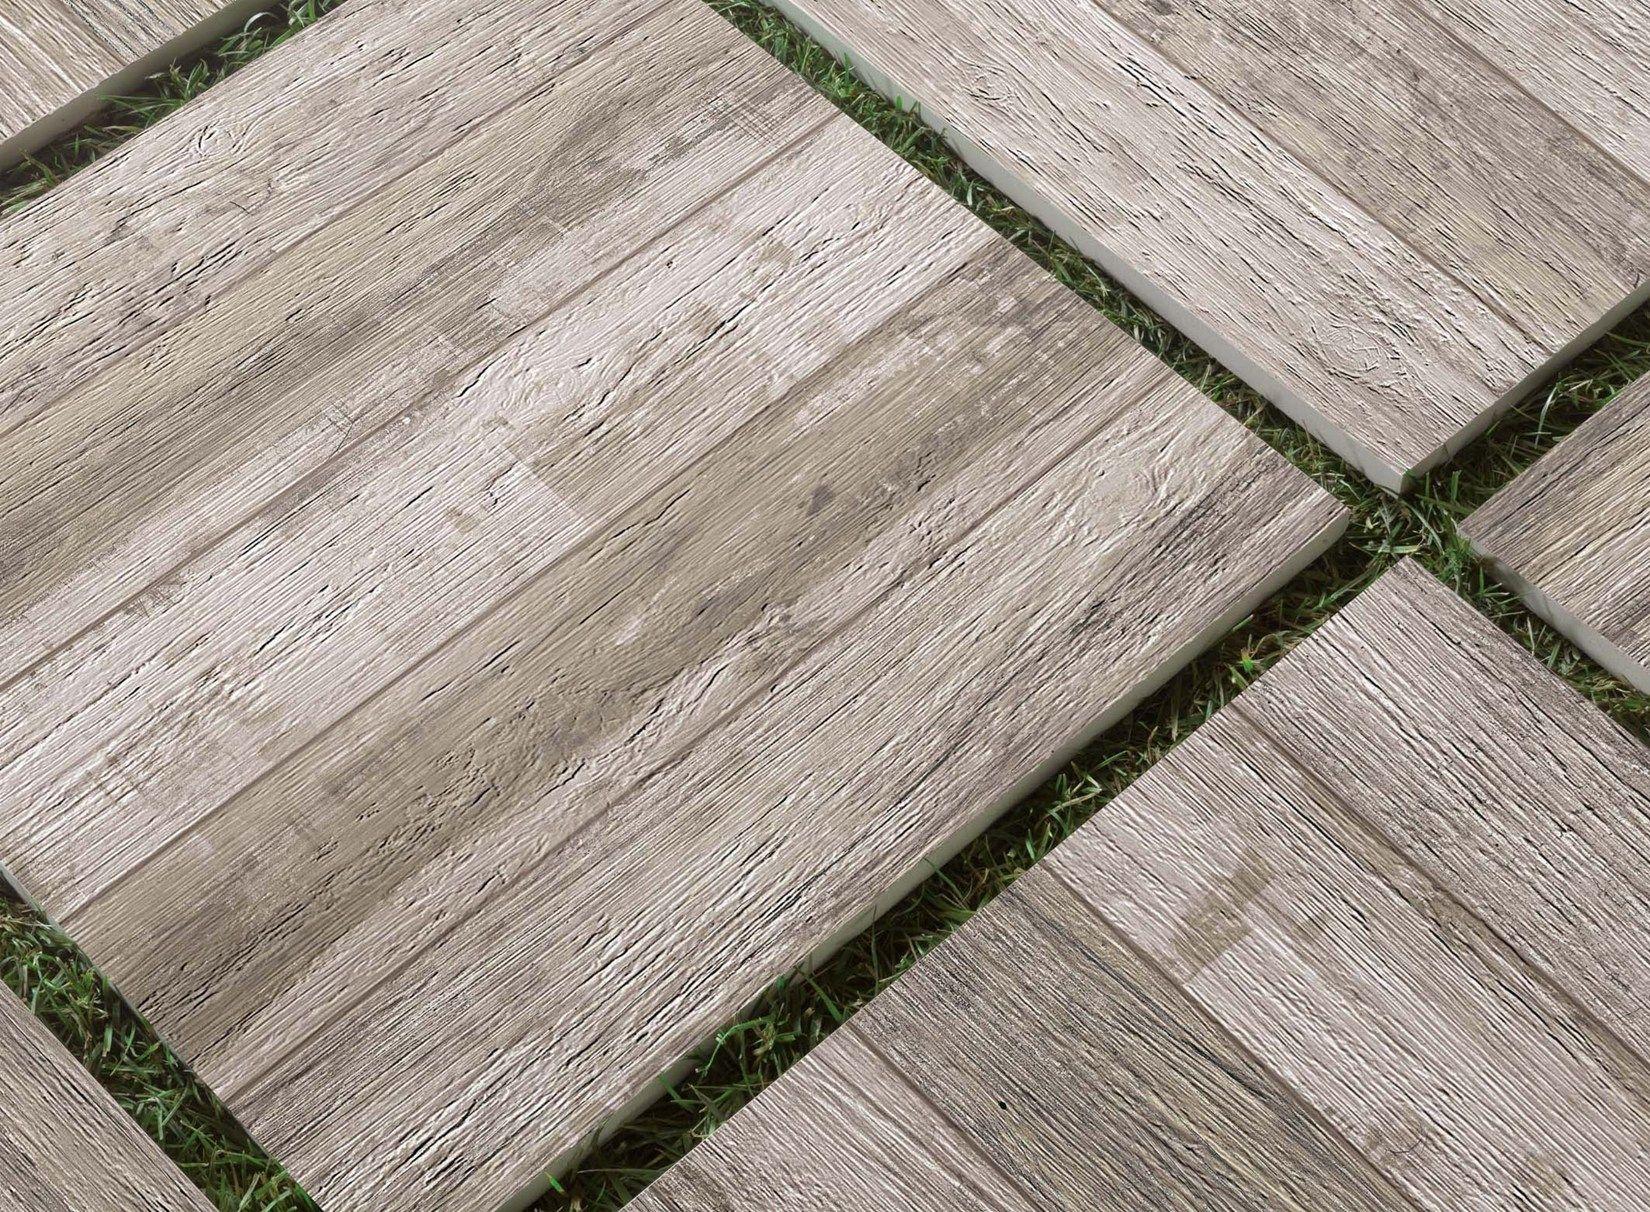 Gres porcellanato per outdoor con spessore mm